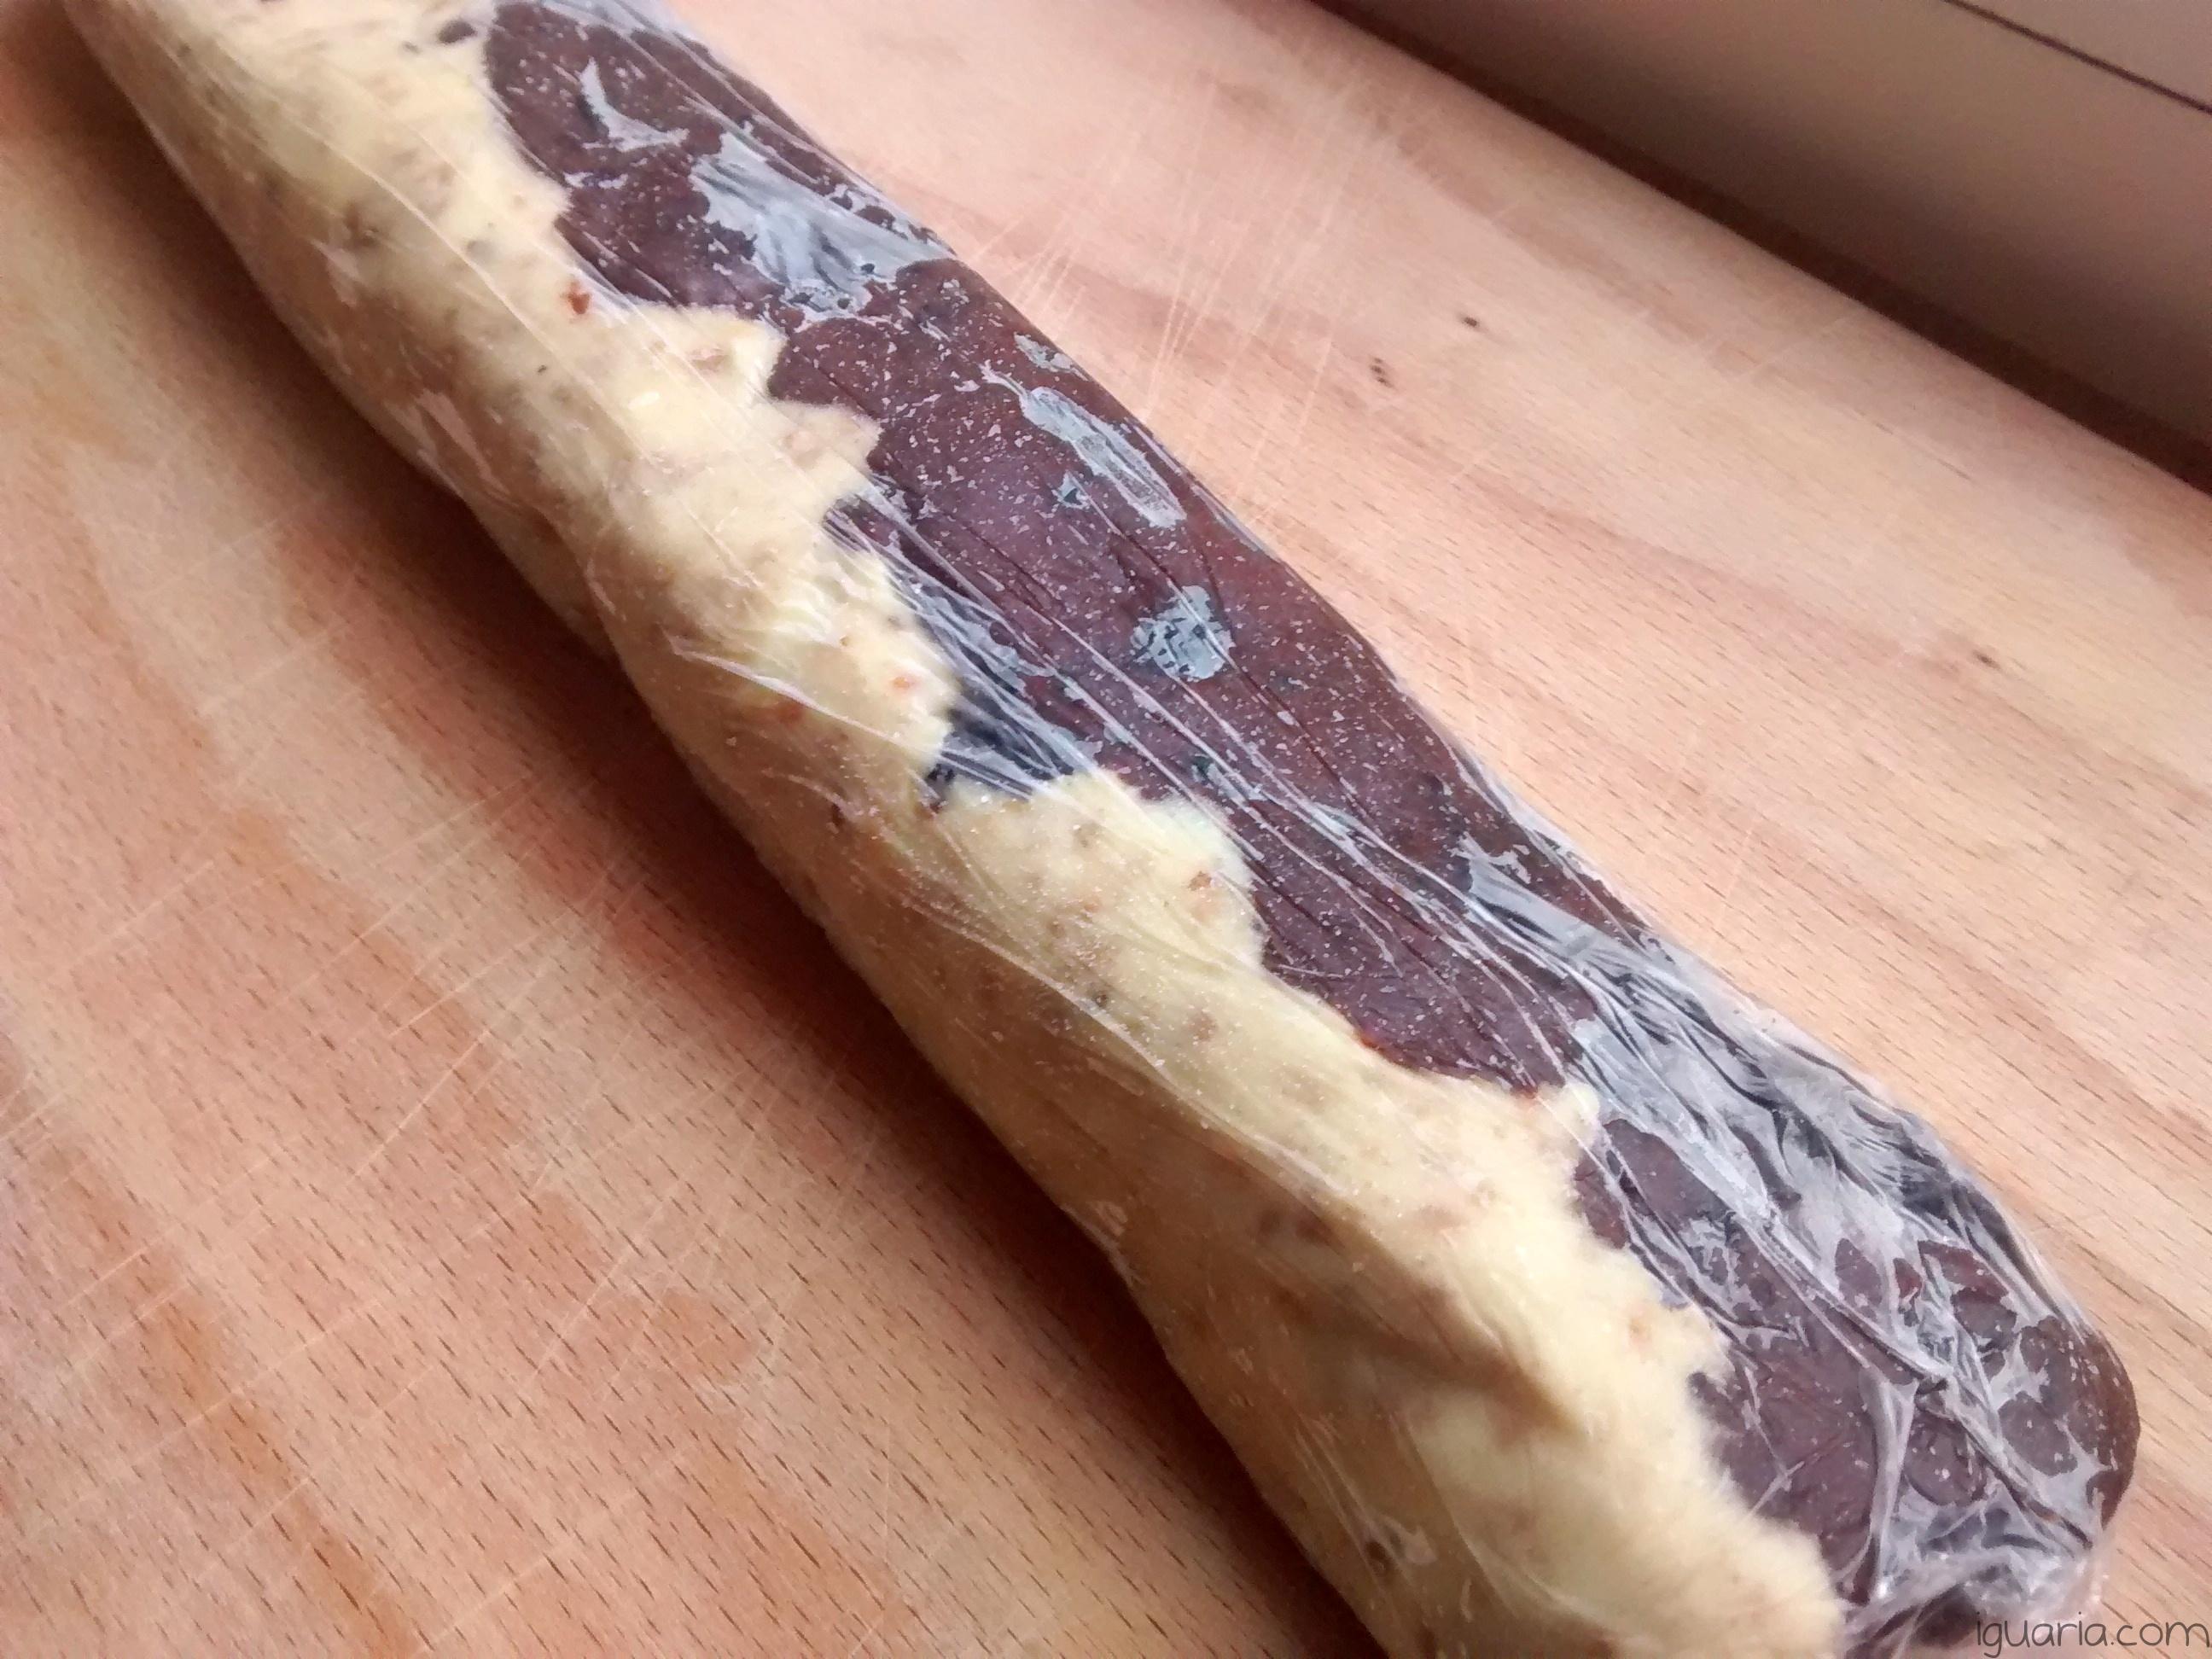 Iguaria_Retirar-Rolo-Massa-Cookie-Congelado